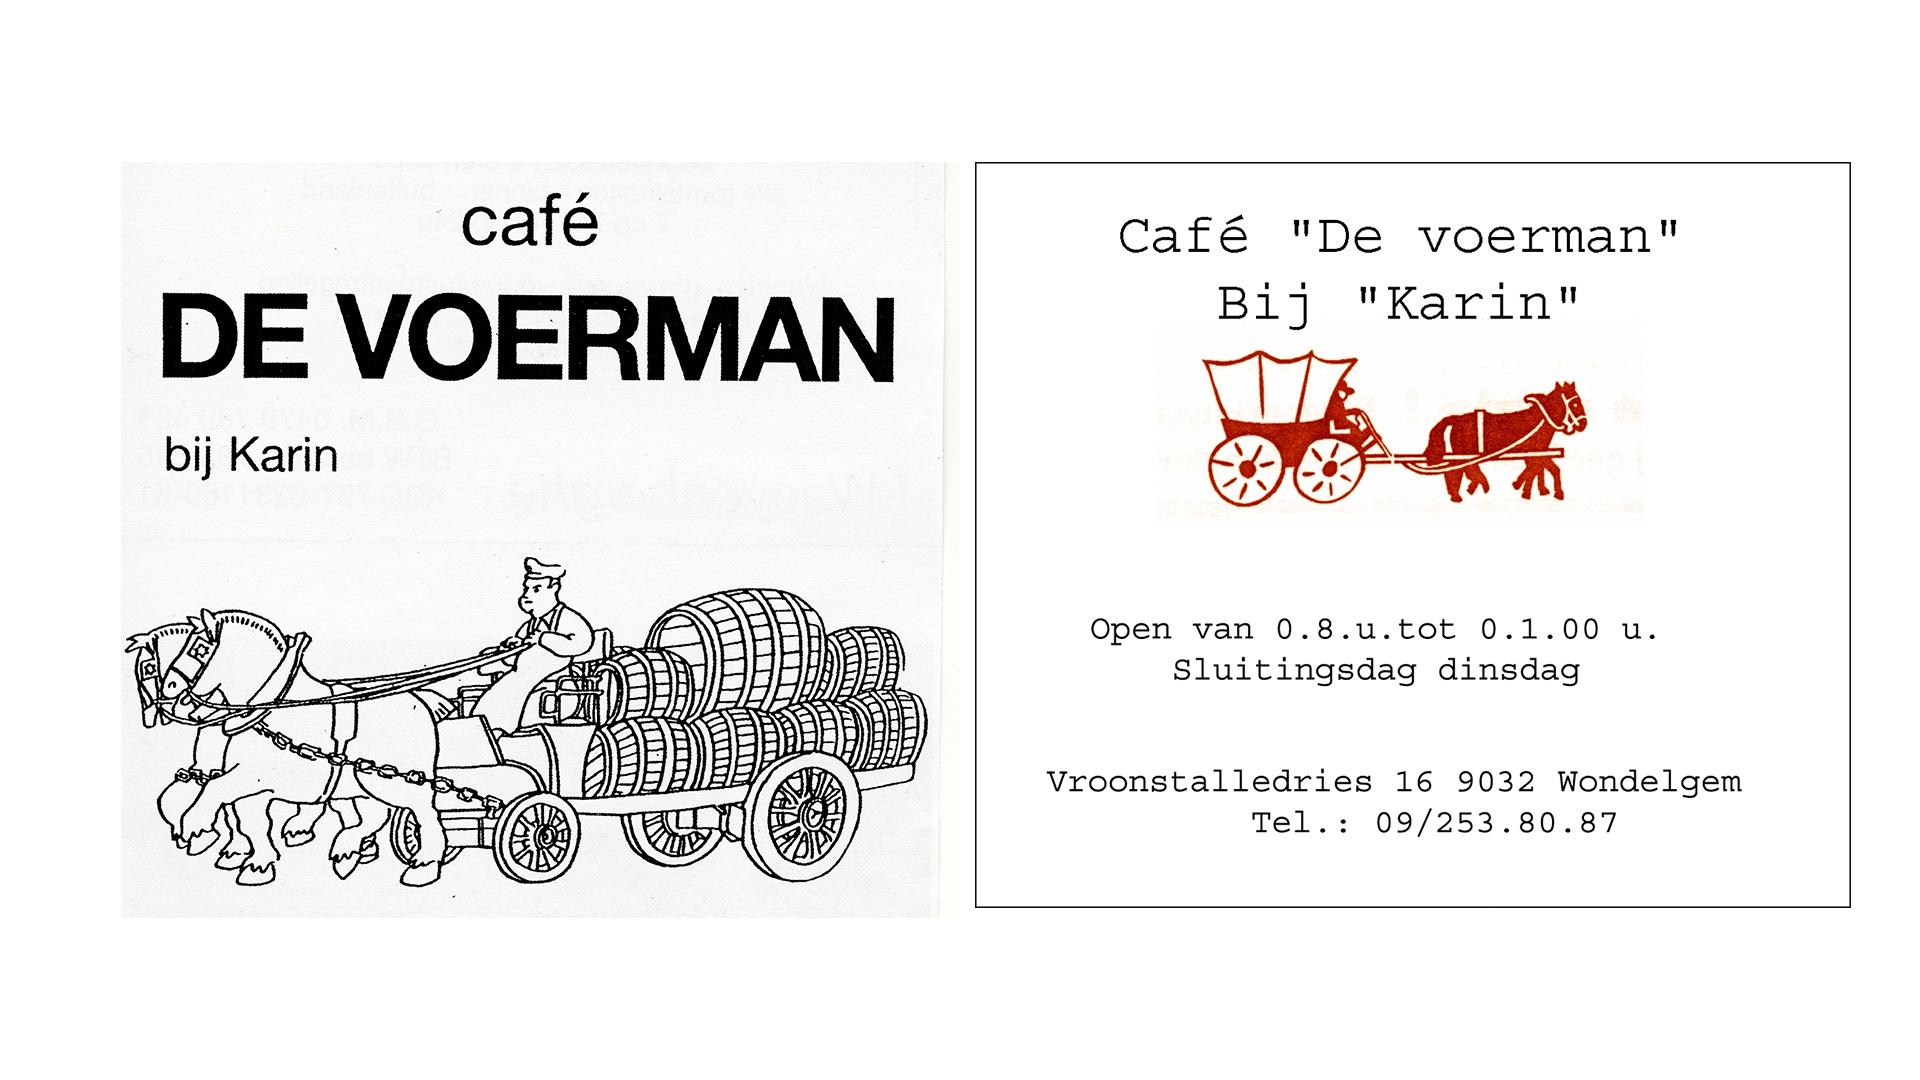 Café De Voerman © 2018